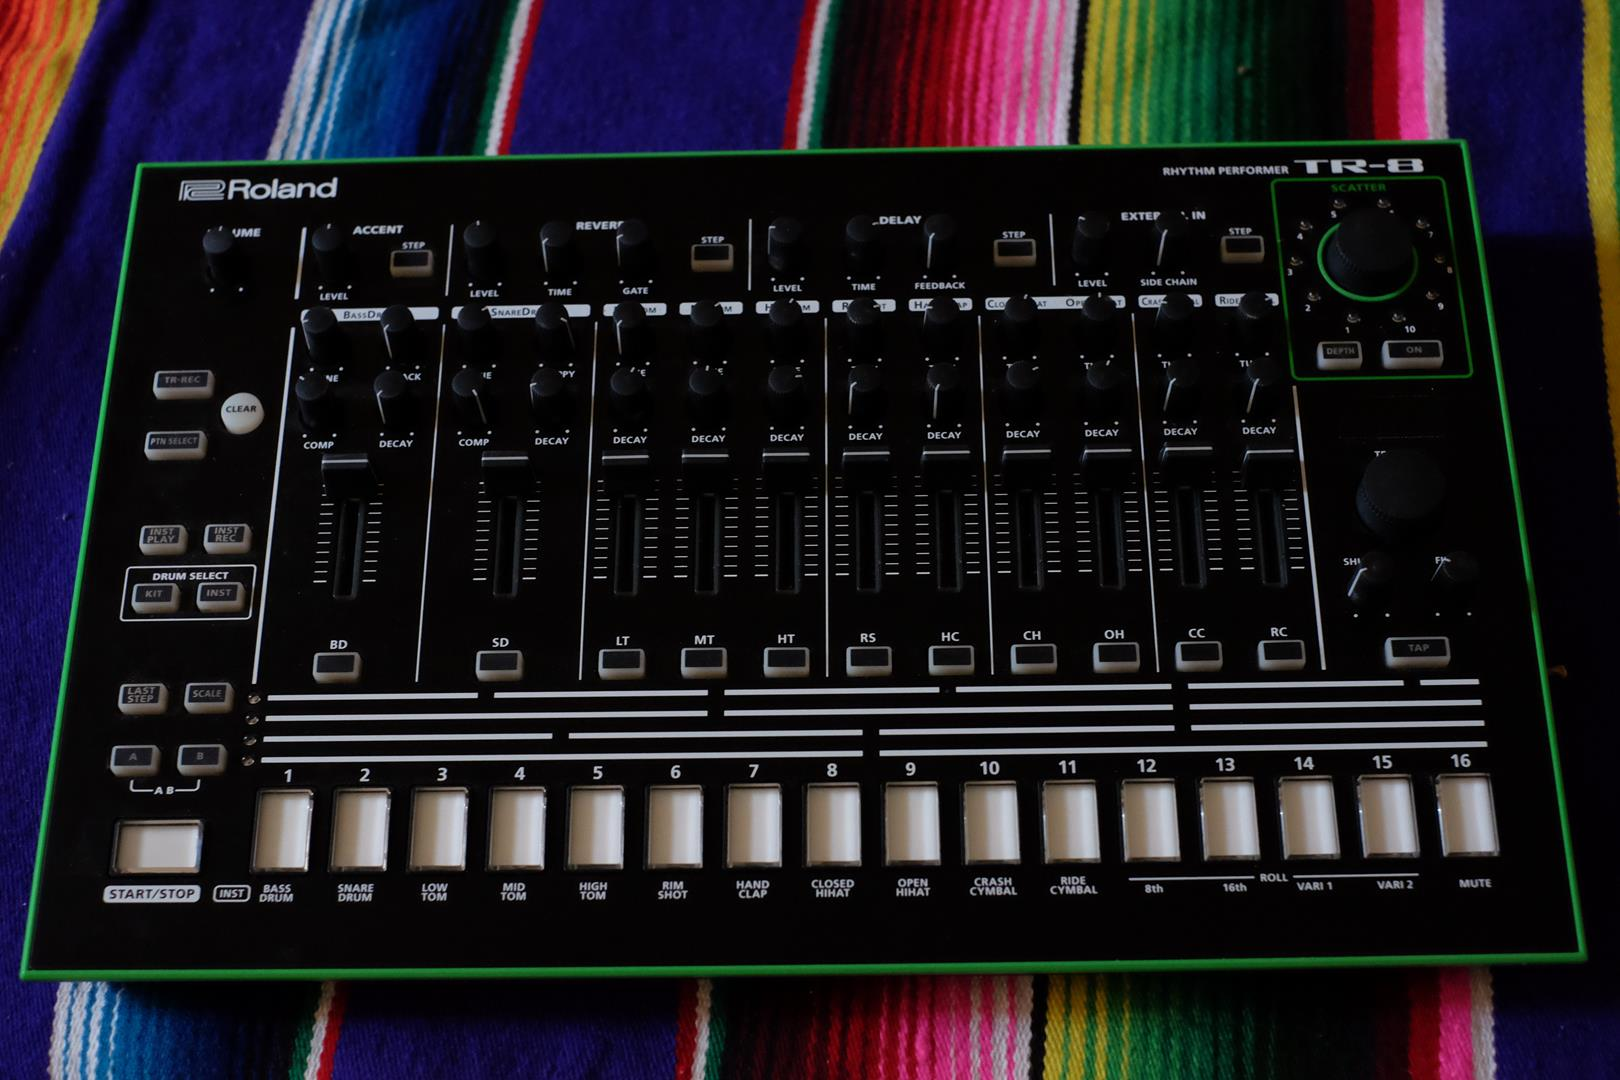 7x7 tr8 drum machine expansion for tr 8 roland audiofanzine. Black Bedroom Furniture Sets. Home Design Ideas